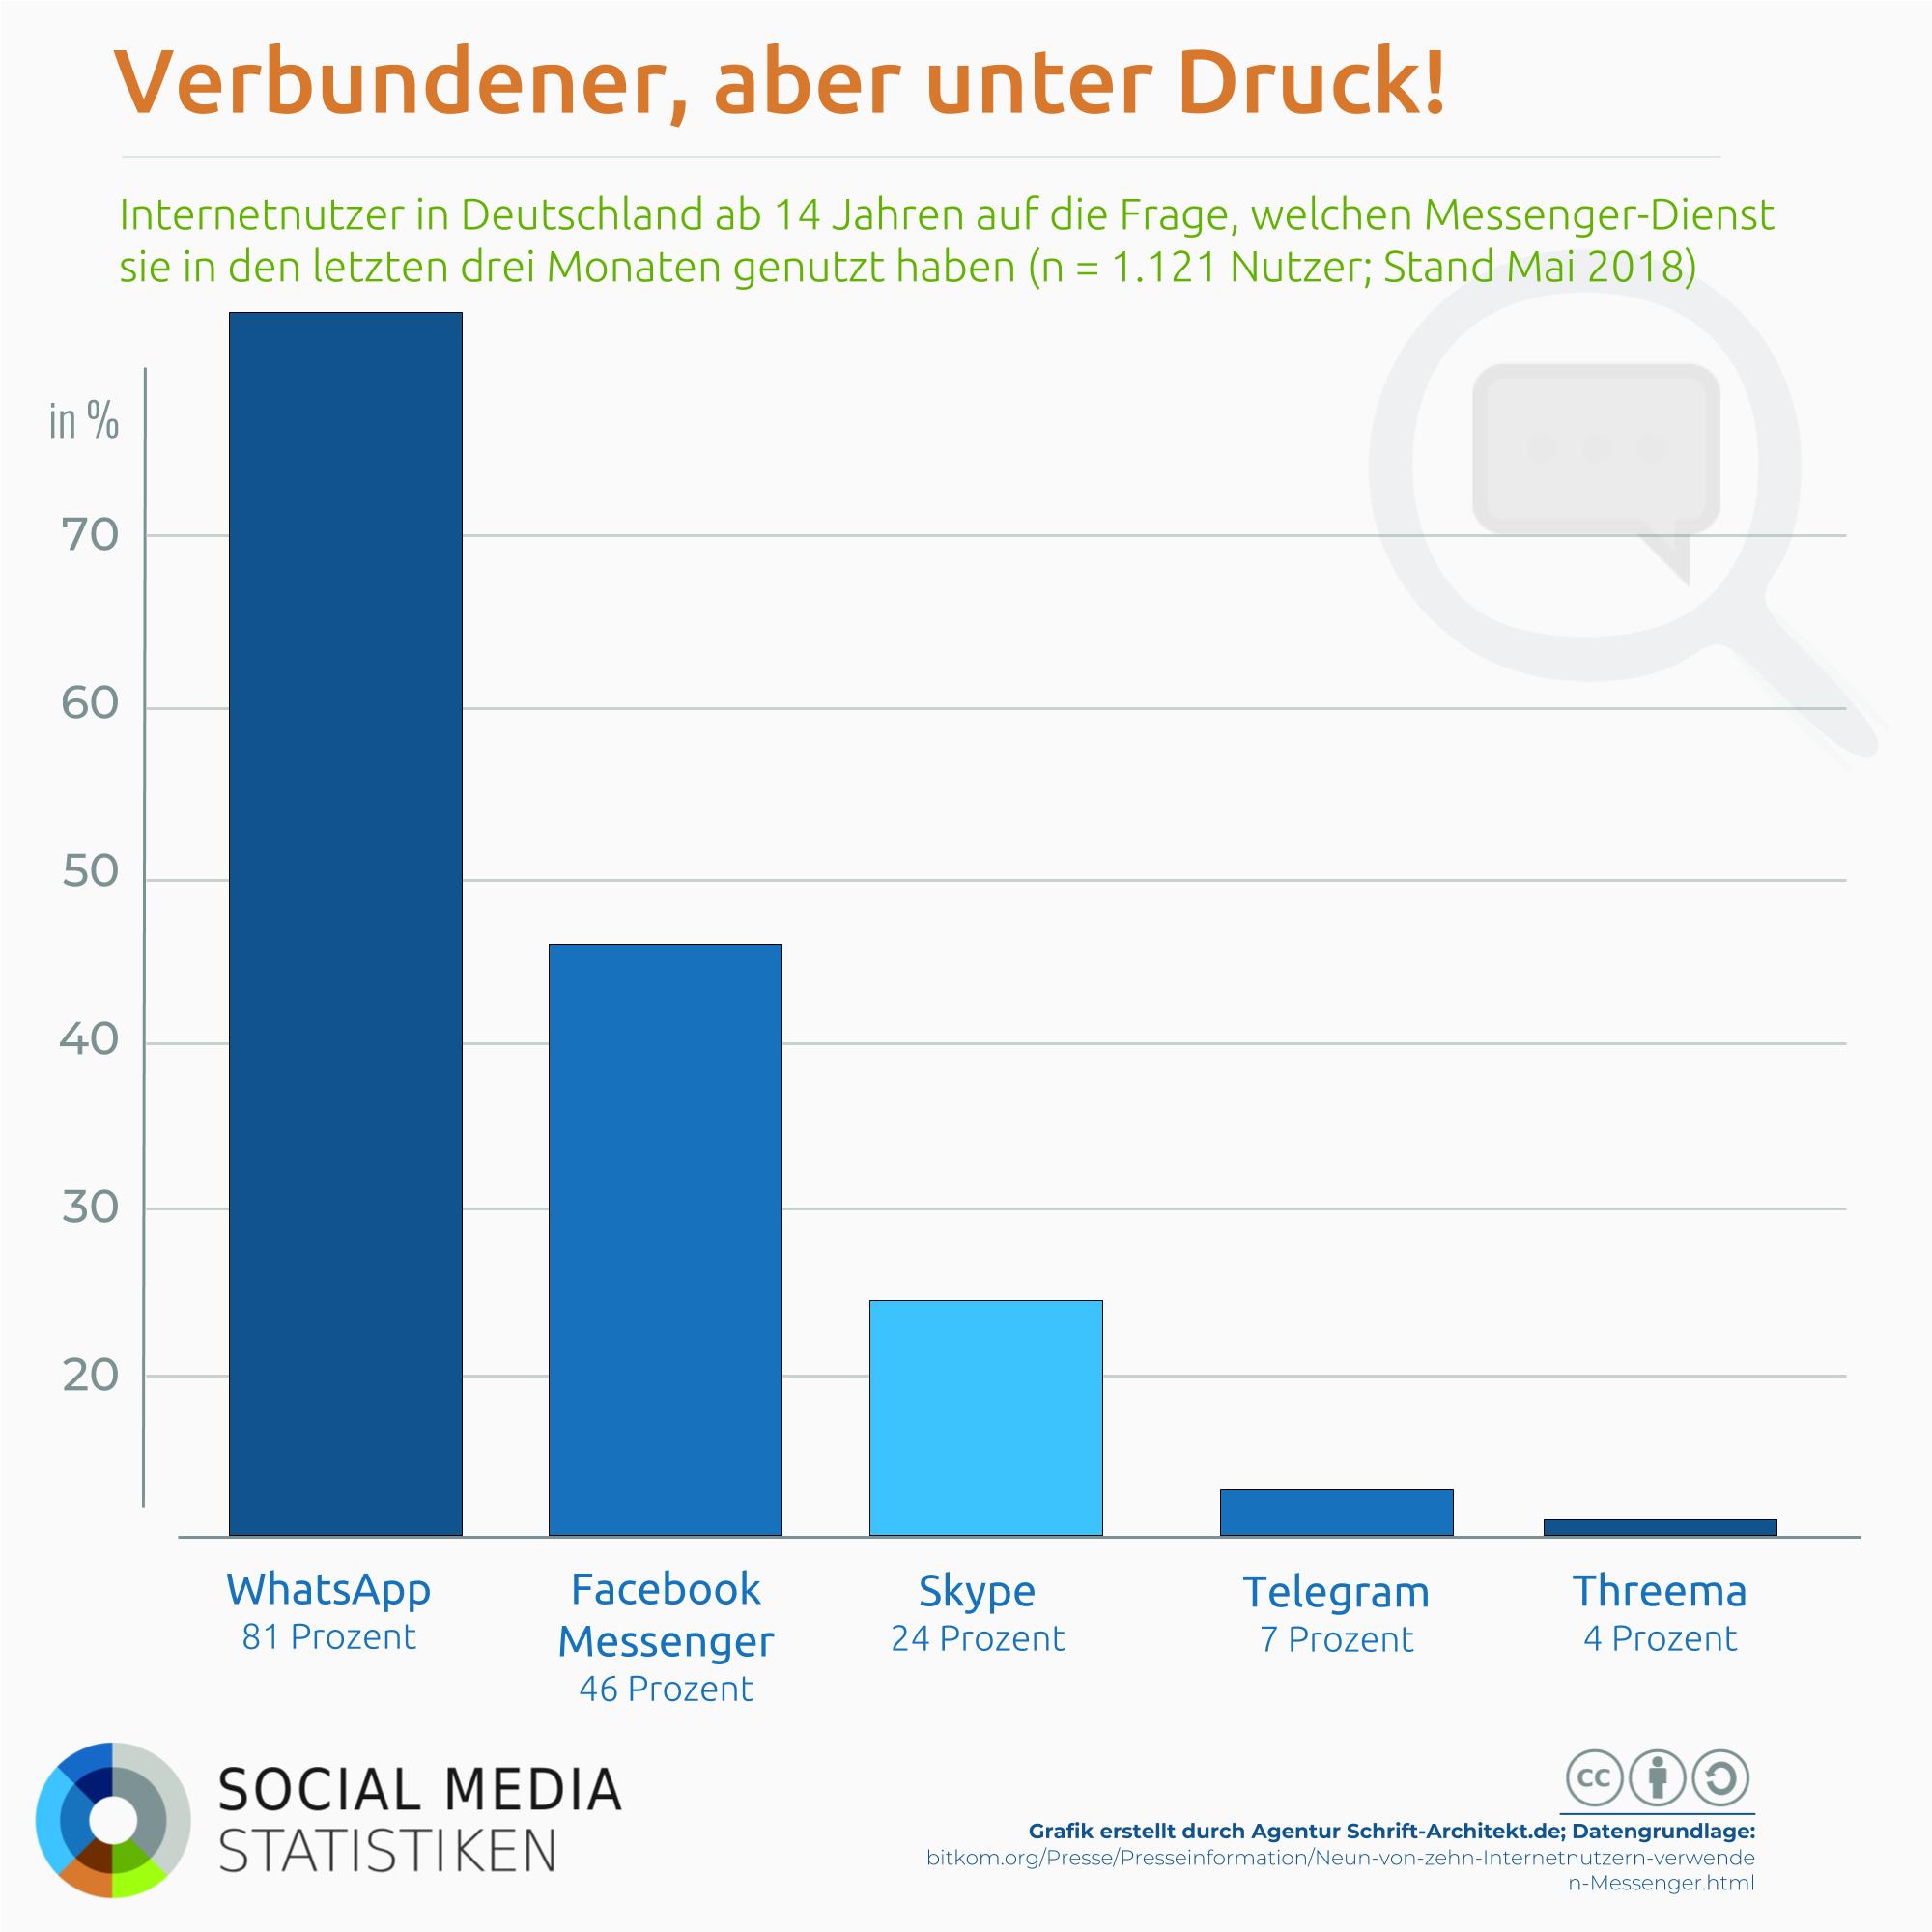 Infografik SocialMediaStatistik.de zum Thema messenger nutzung deutschland